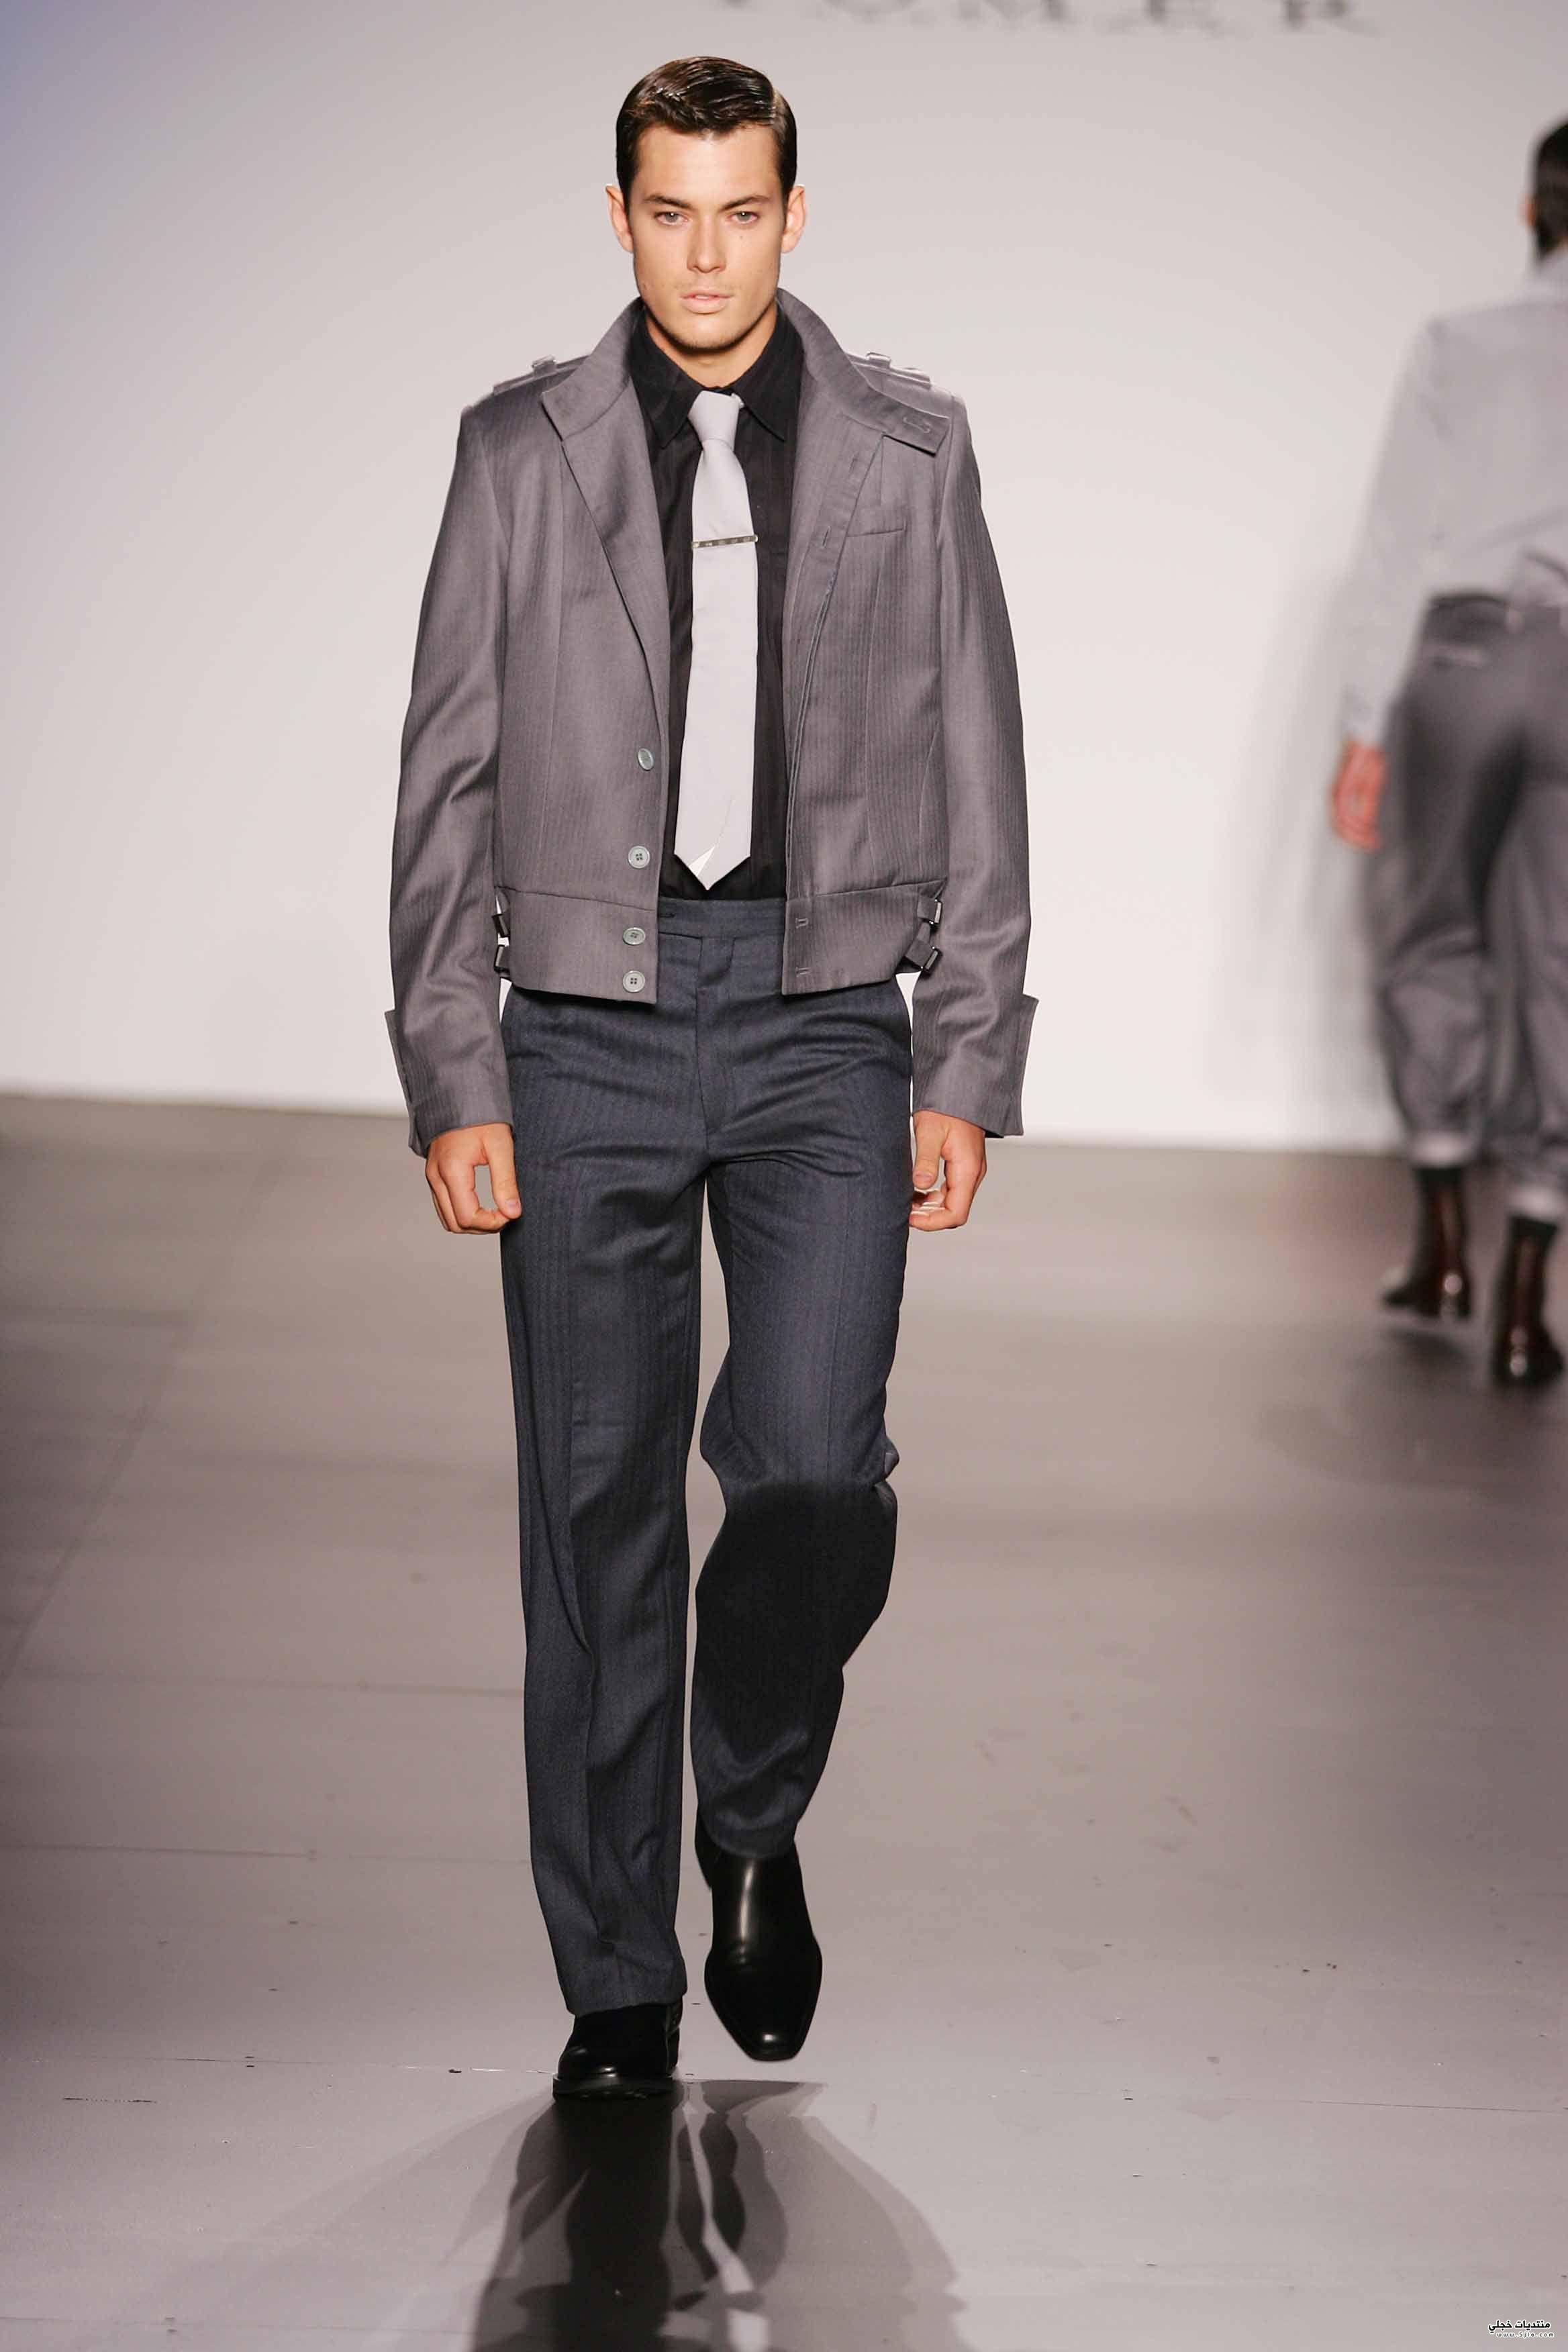 Skinny high fashion male models Fashion 101: How Do Designers Get Fabrics? Searching